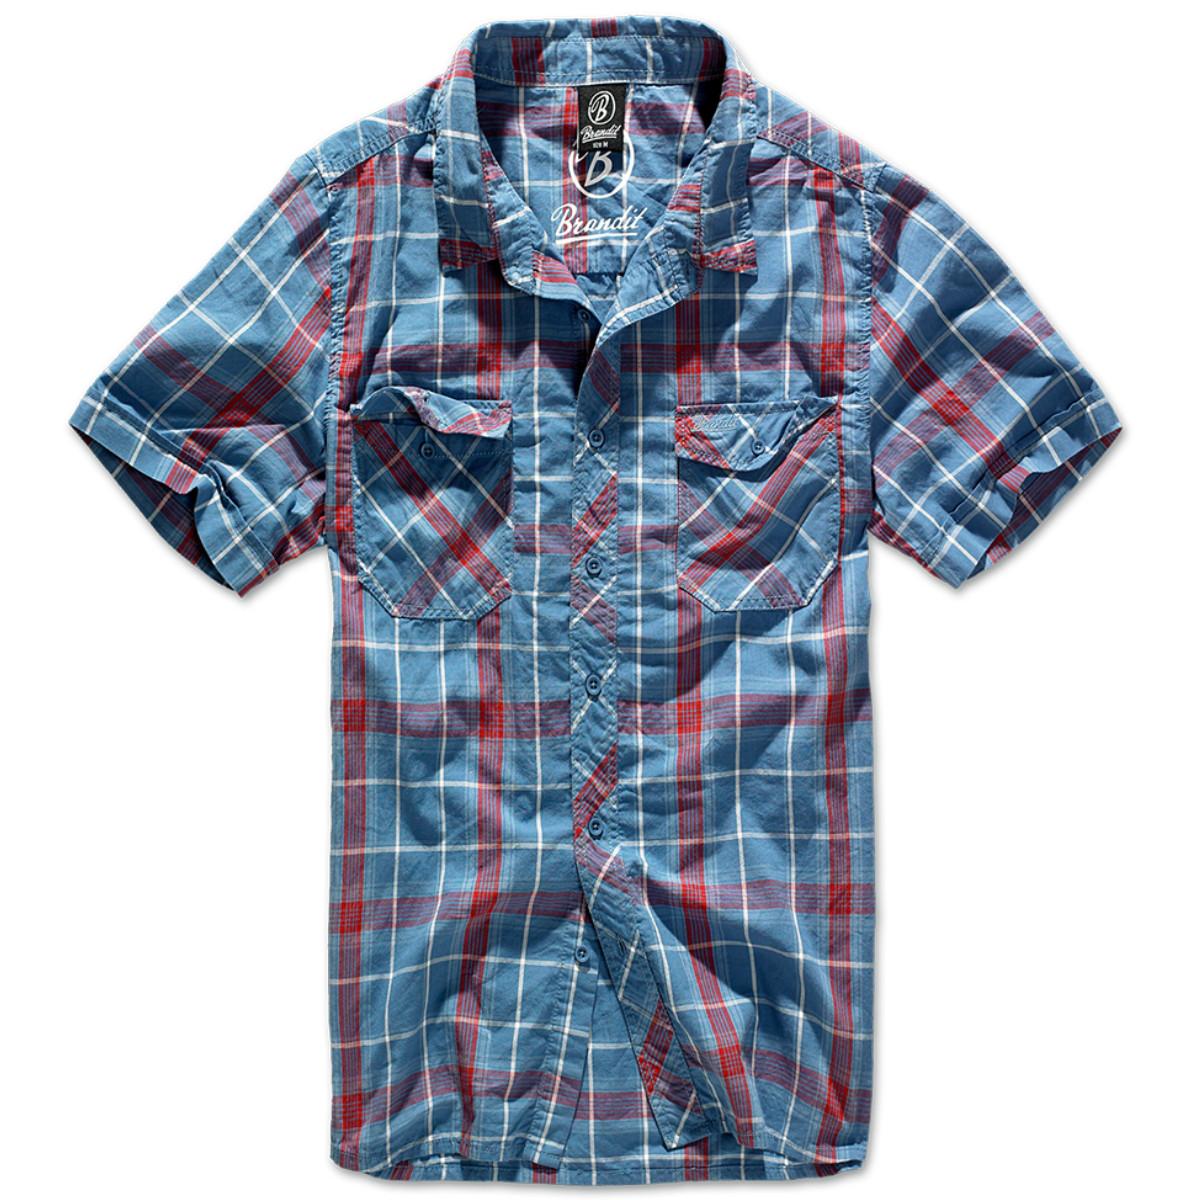 Рубашка в клетку мужская Brandit Roadstar RED-BLUE